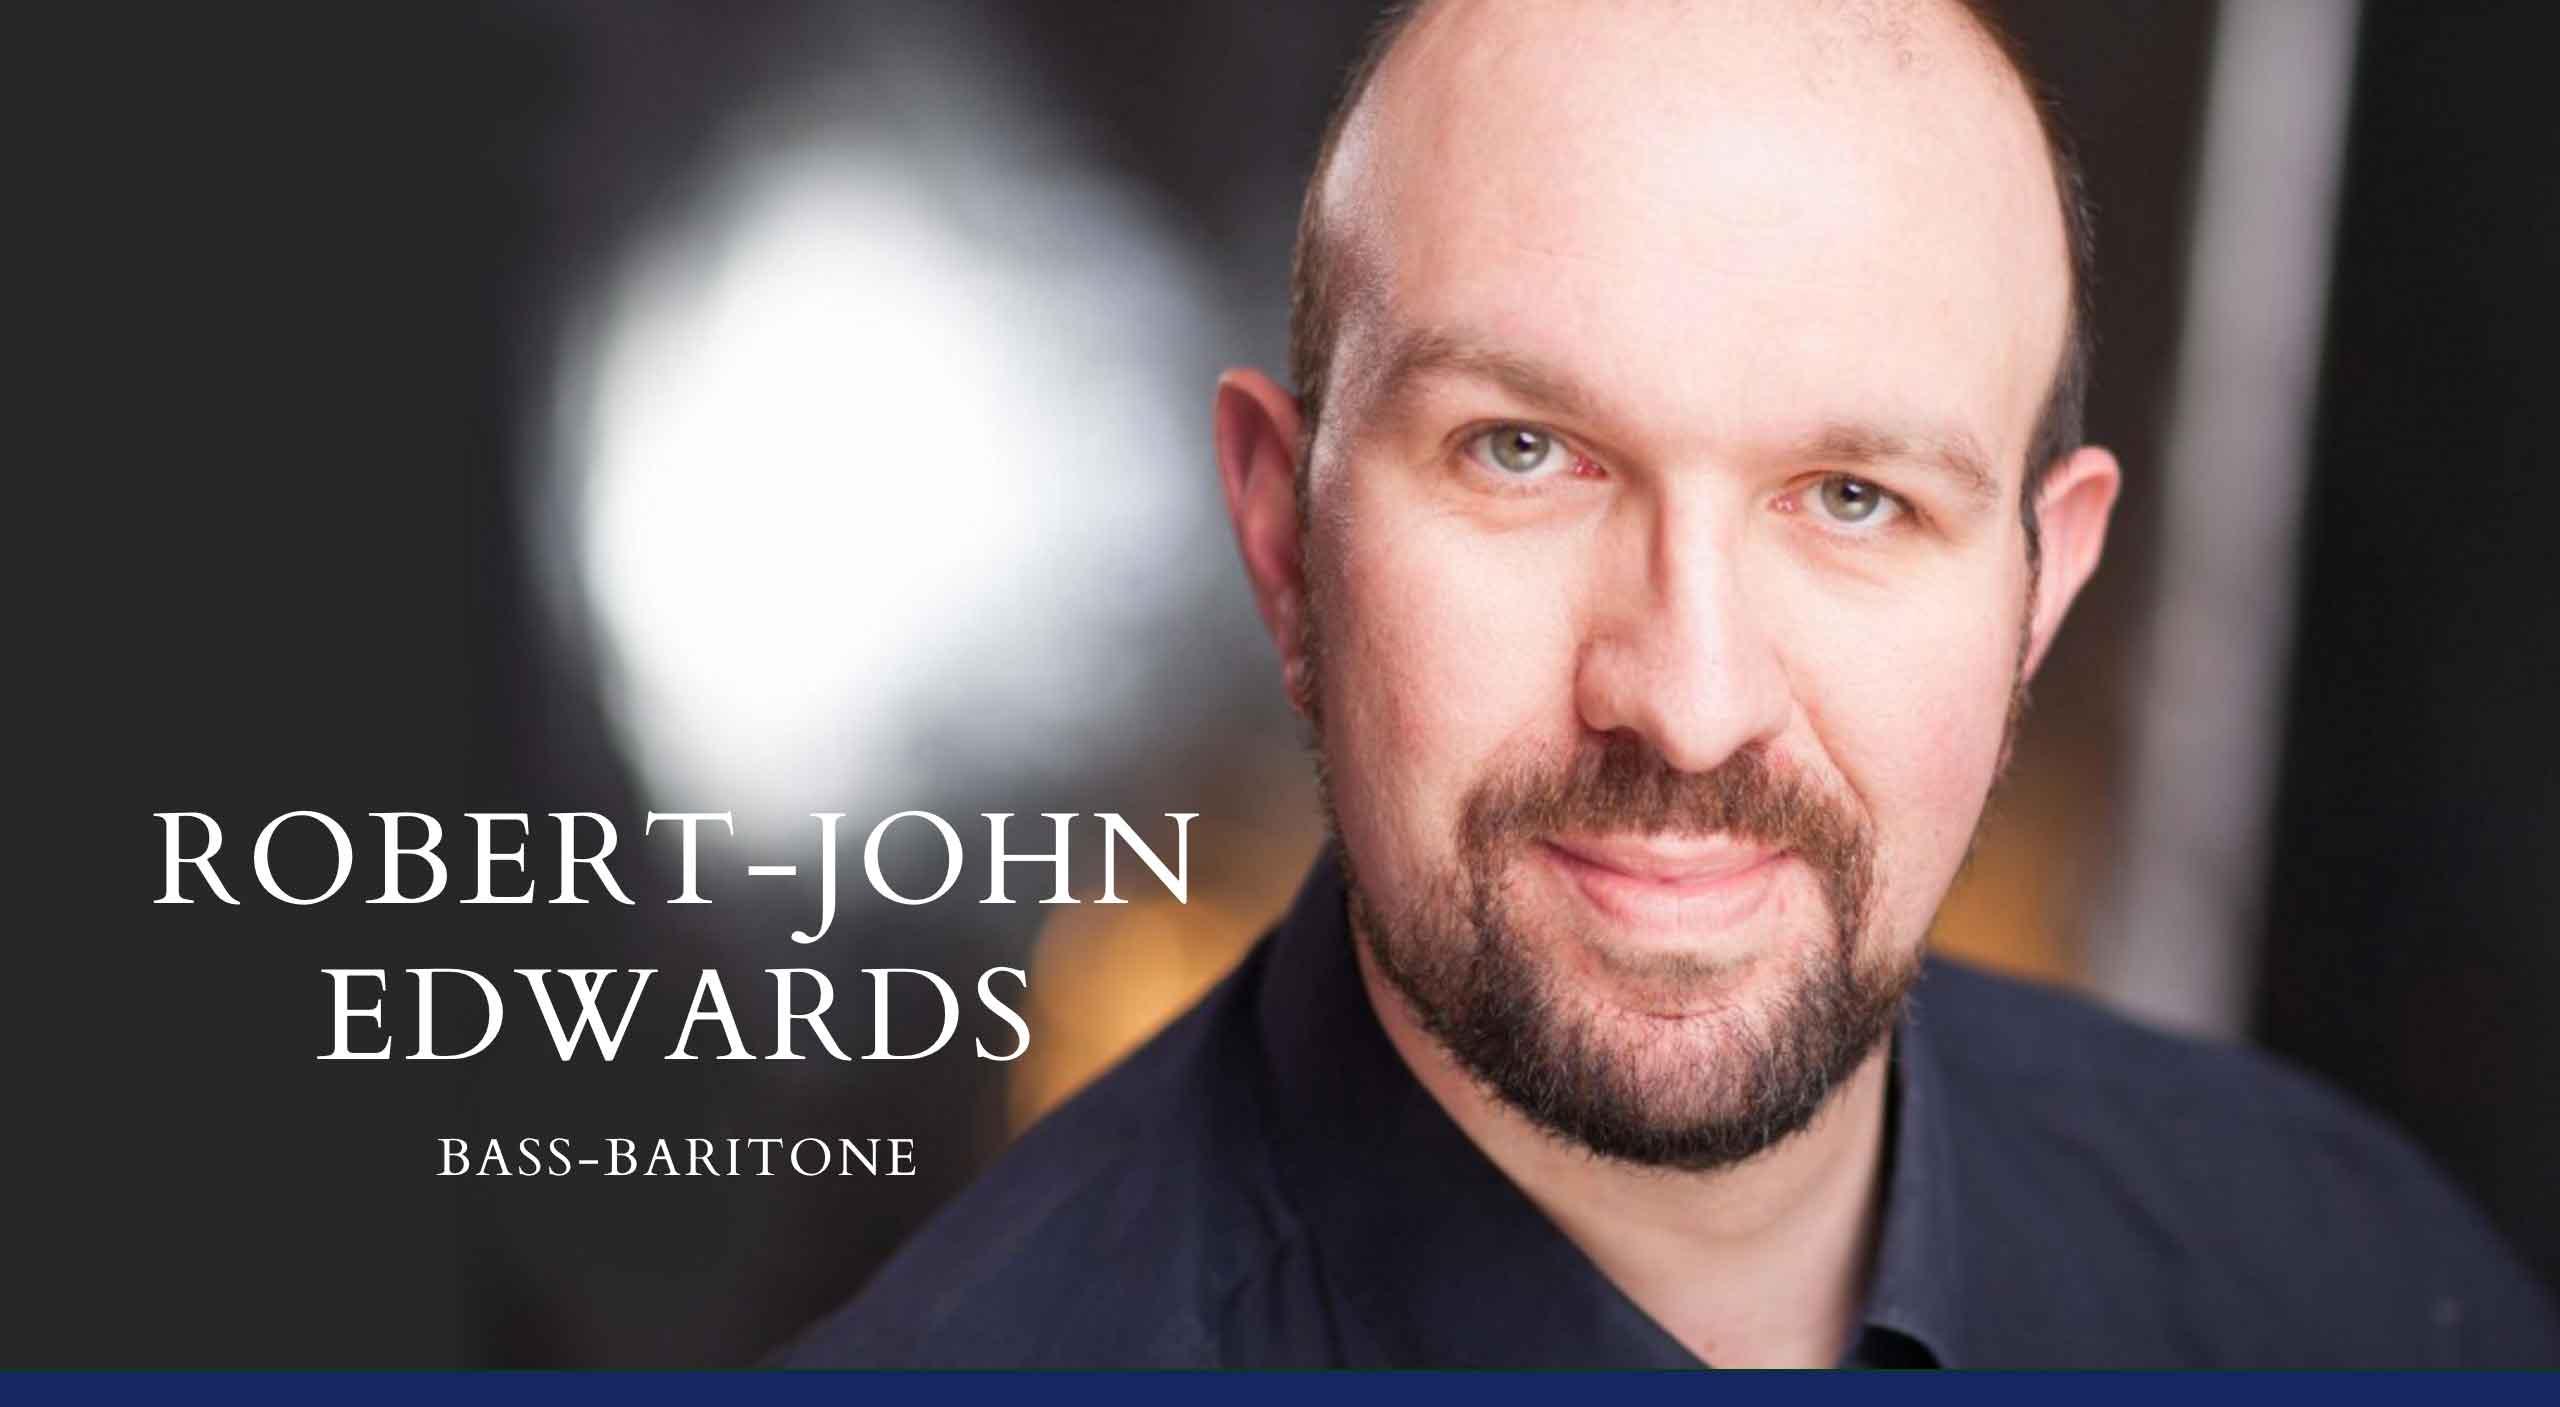 Bass-Baritone Robert-John Edwards Profile Picture.